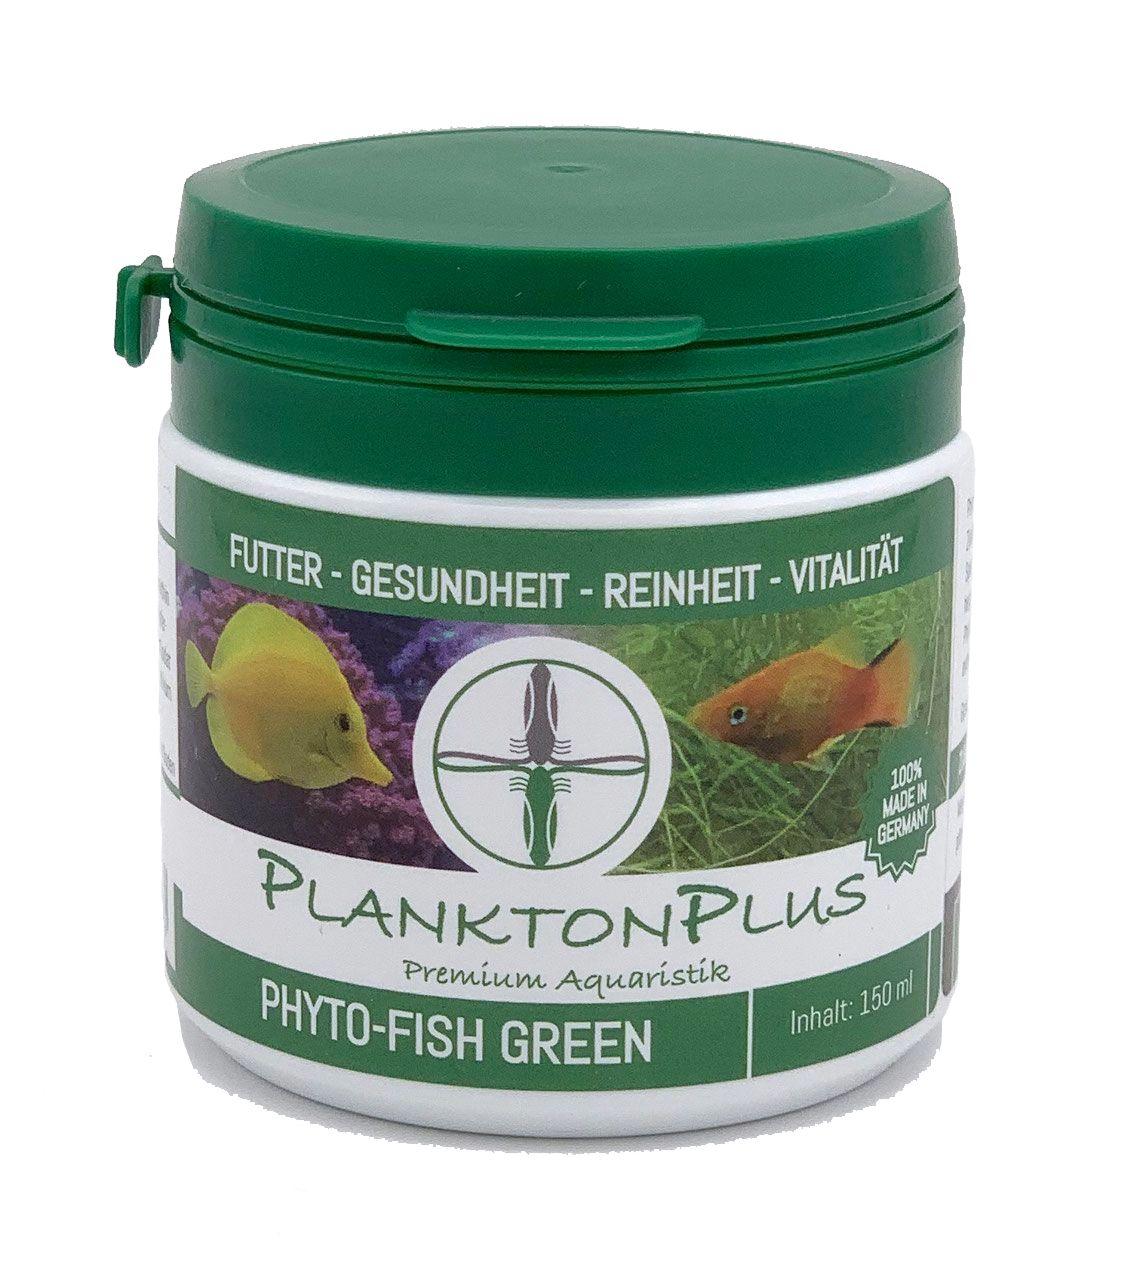 PlanktonPlus Phyto-Fish Green L 750 ml